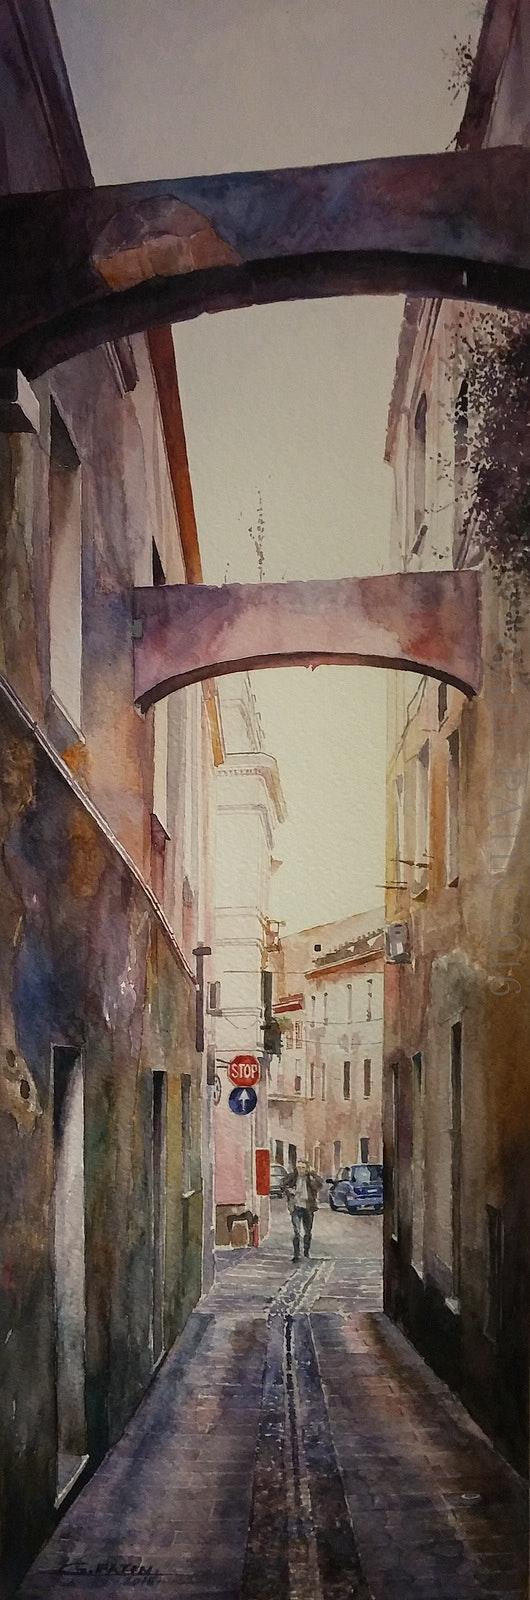 Aux dernières lueurs… Via Maddalena, Sassari. Gaël Patin Gaël Patin